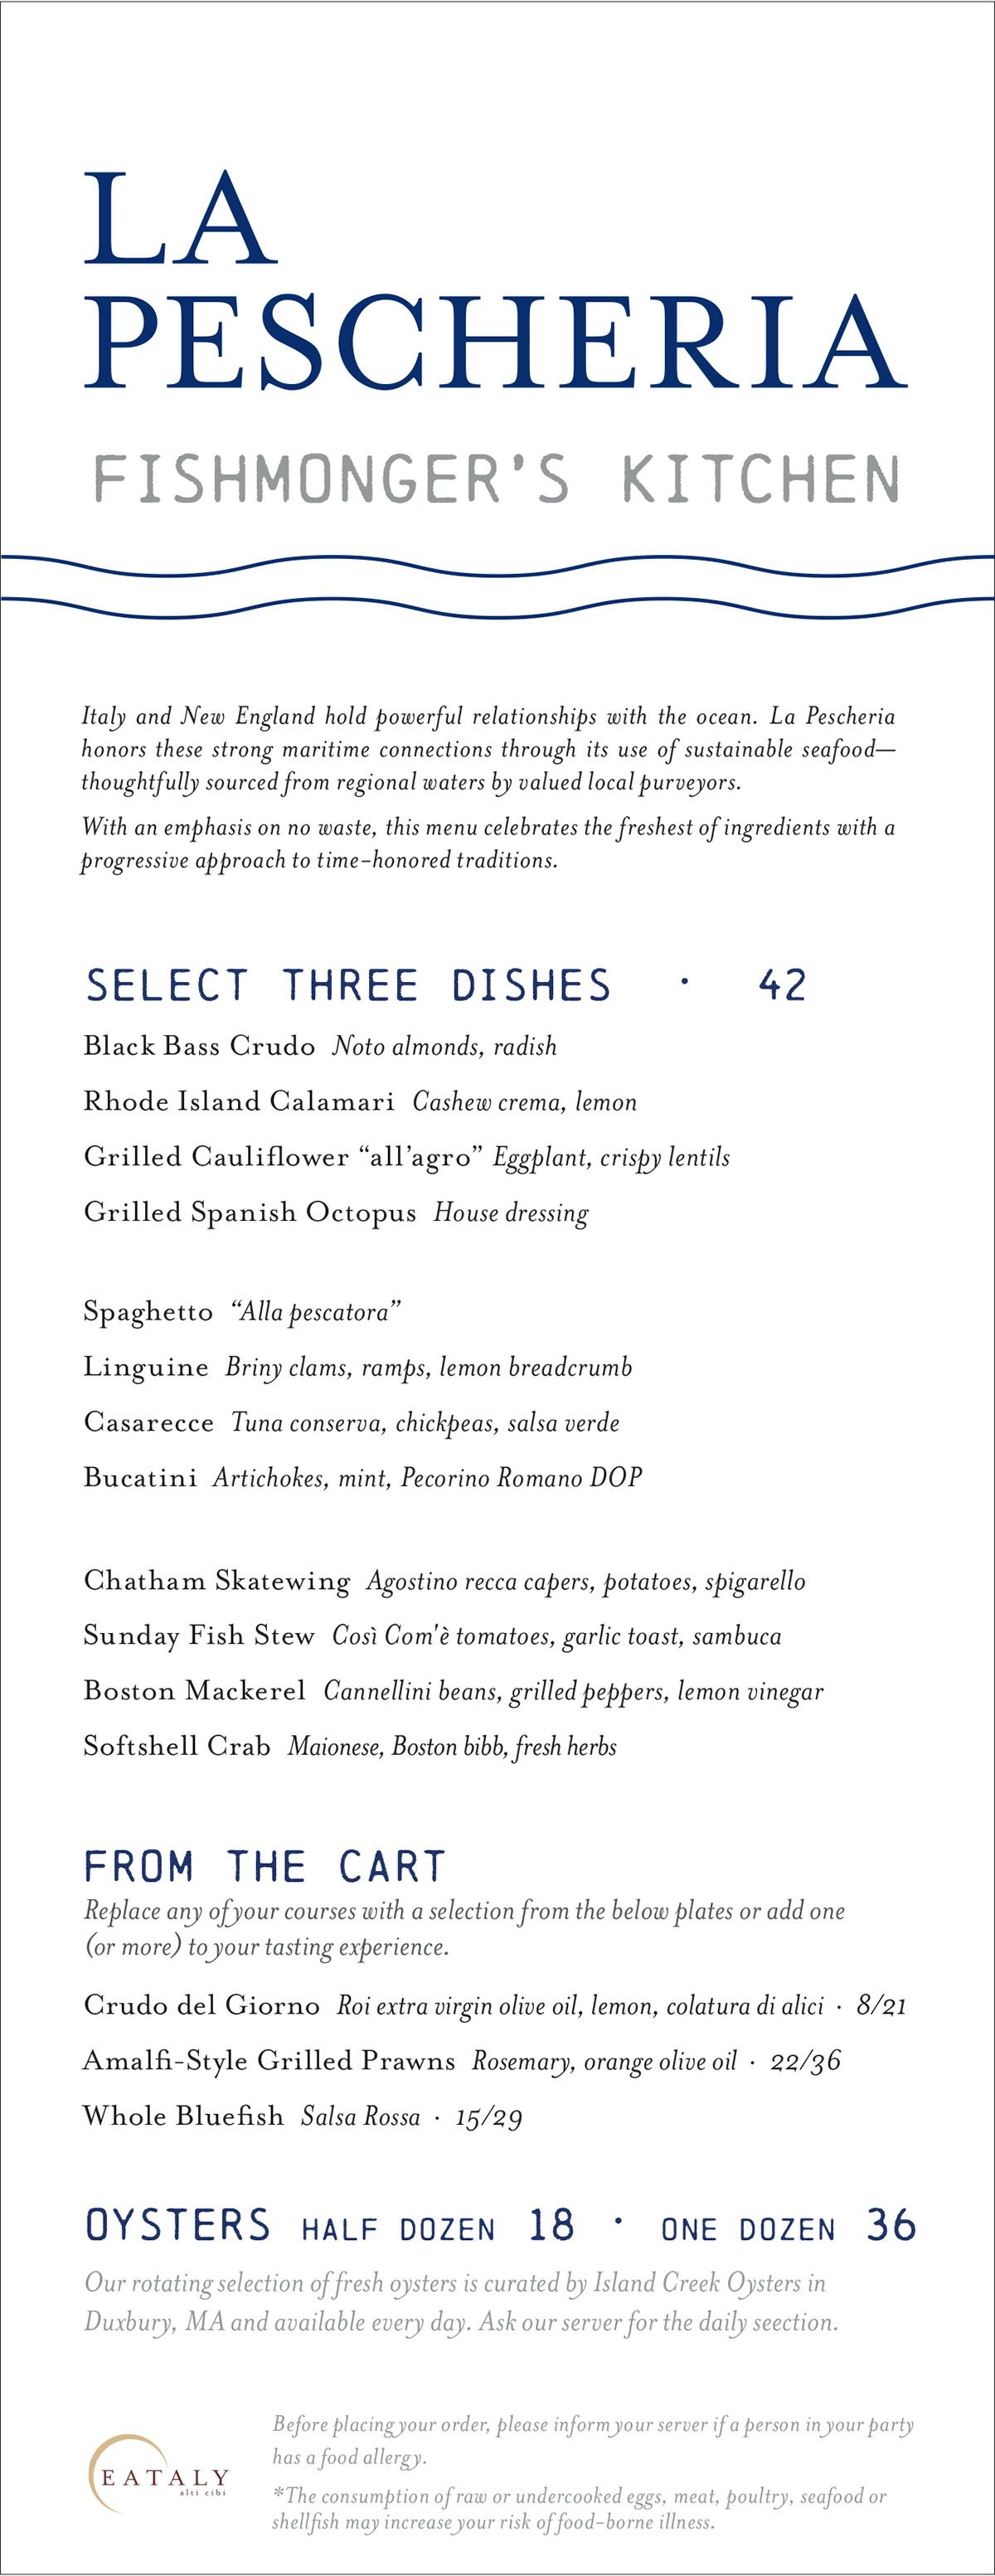 La Pescheria dinner menu at Eataly Boston